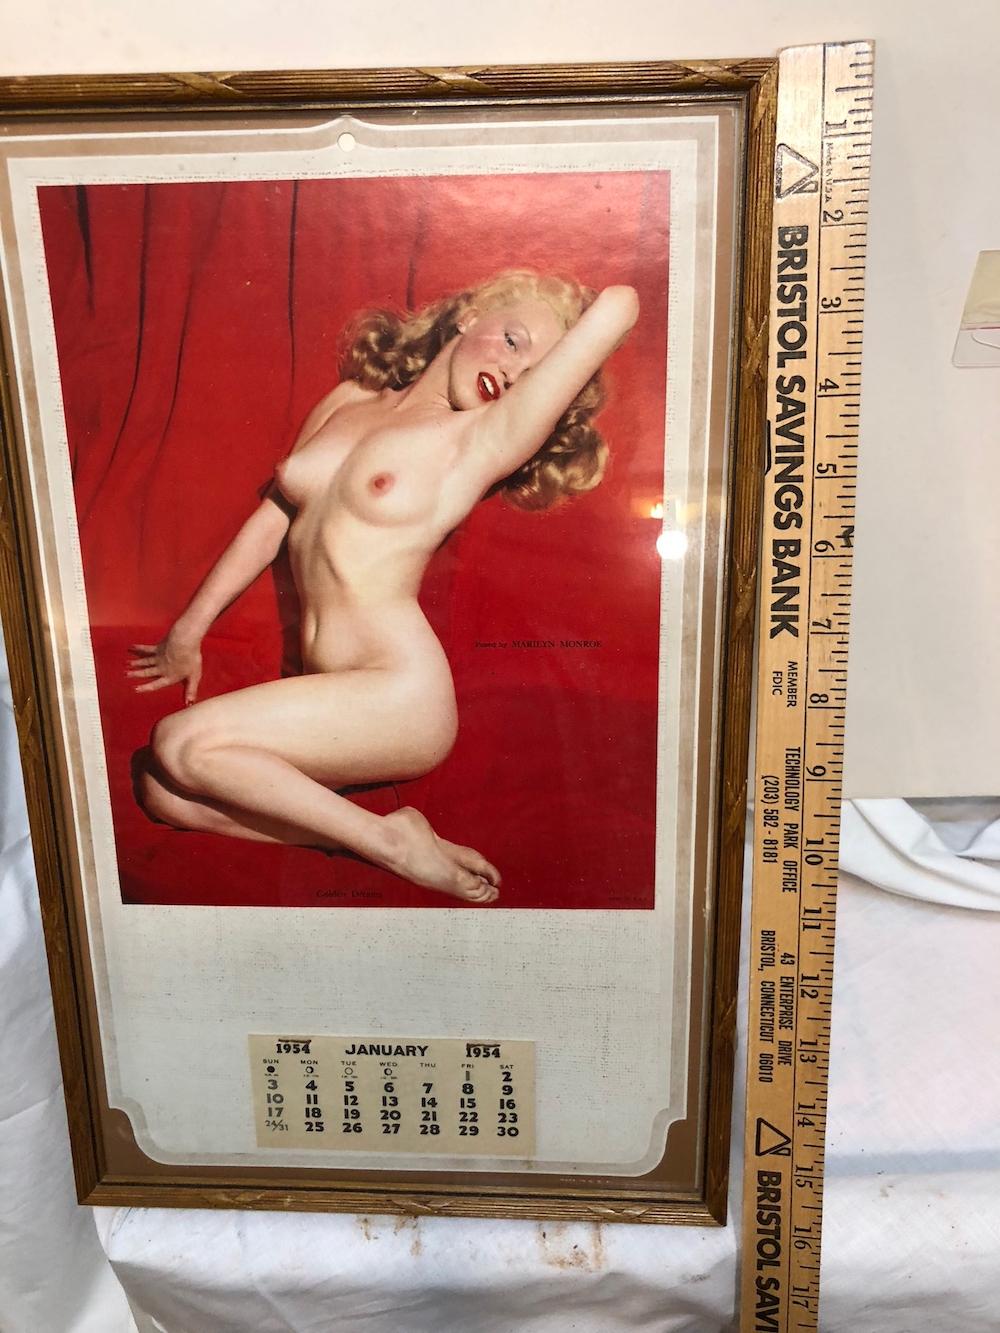 Marilyn Monroe 1954 Calendar